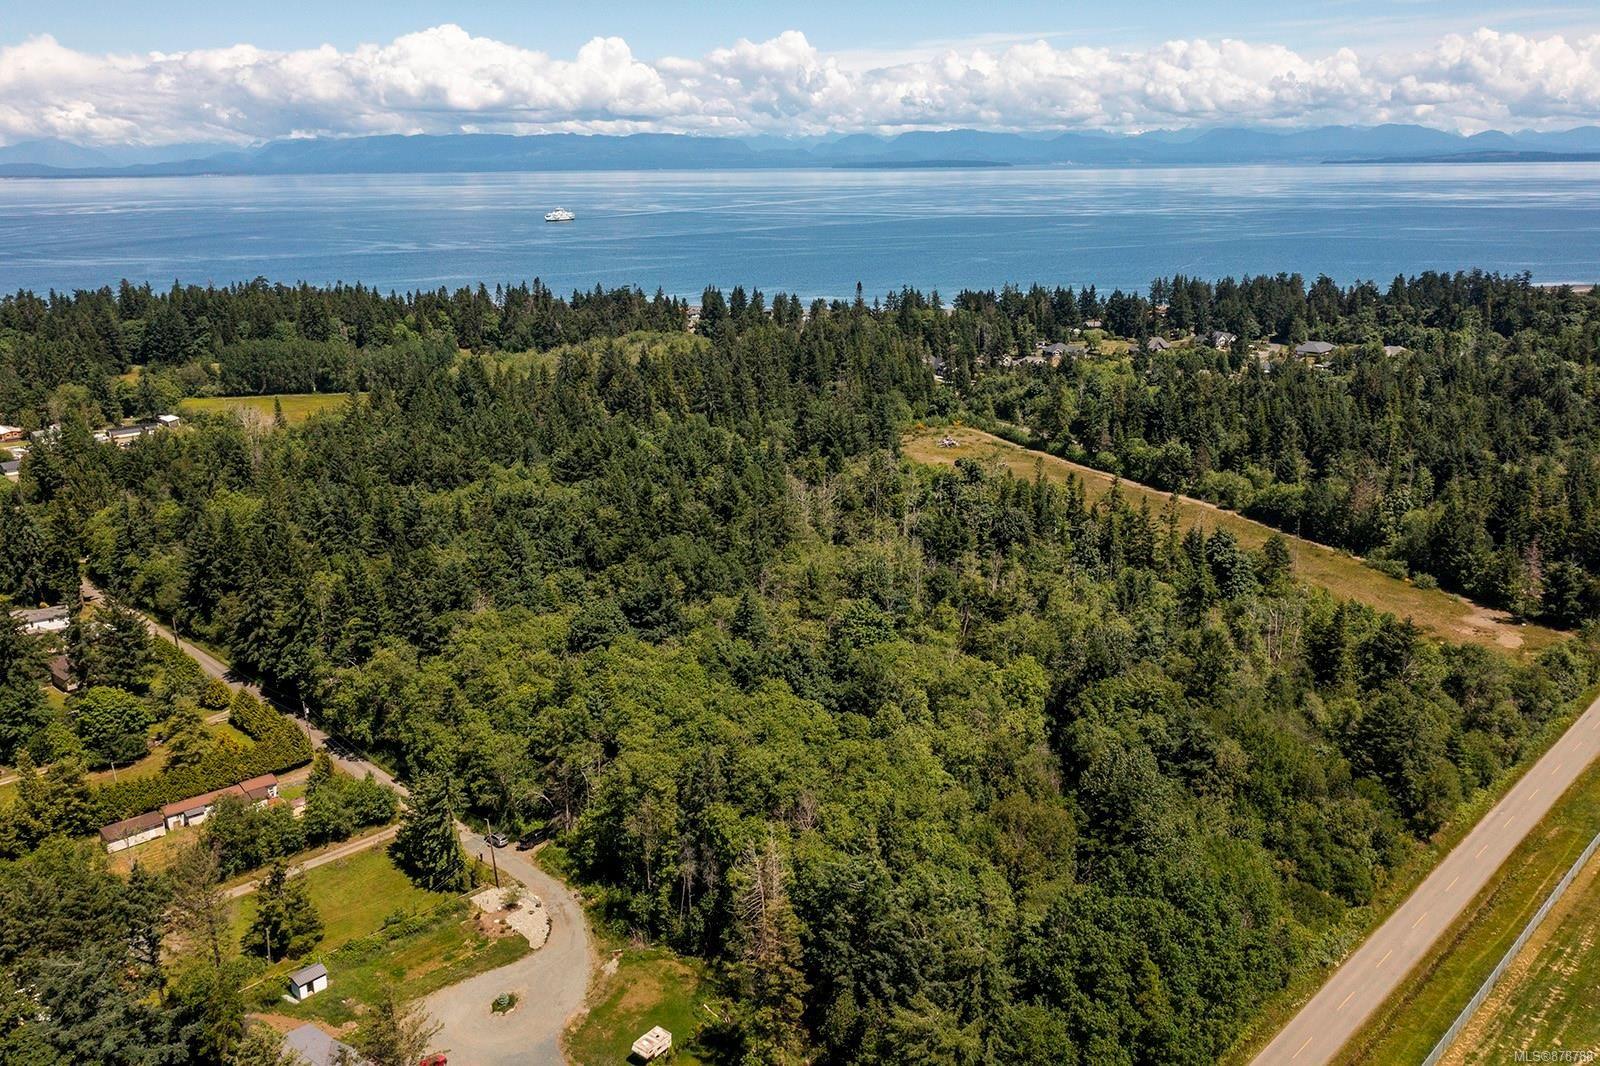 Main Photo: 1752 Little River Rd in : CV Comox Peninsula Land for sale (Comox Valley)  : MLS®# 878788